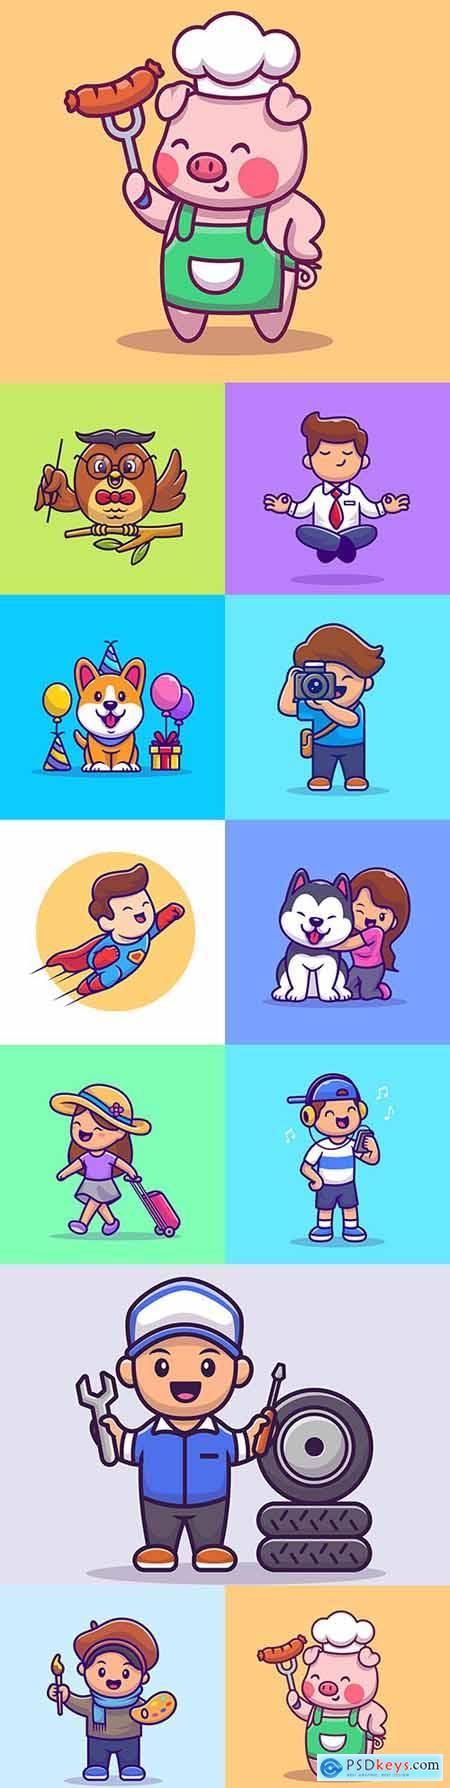 Emblem mascot and Brand name logos design 14